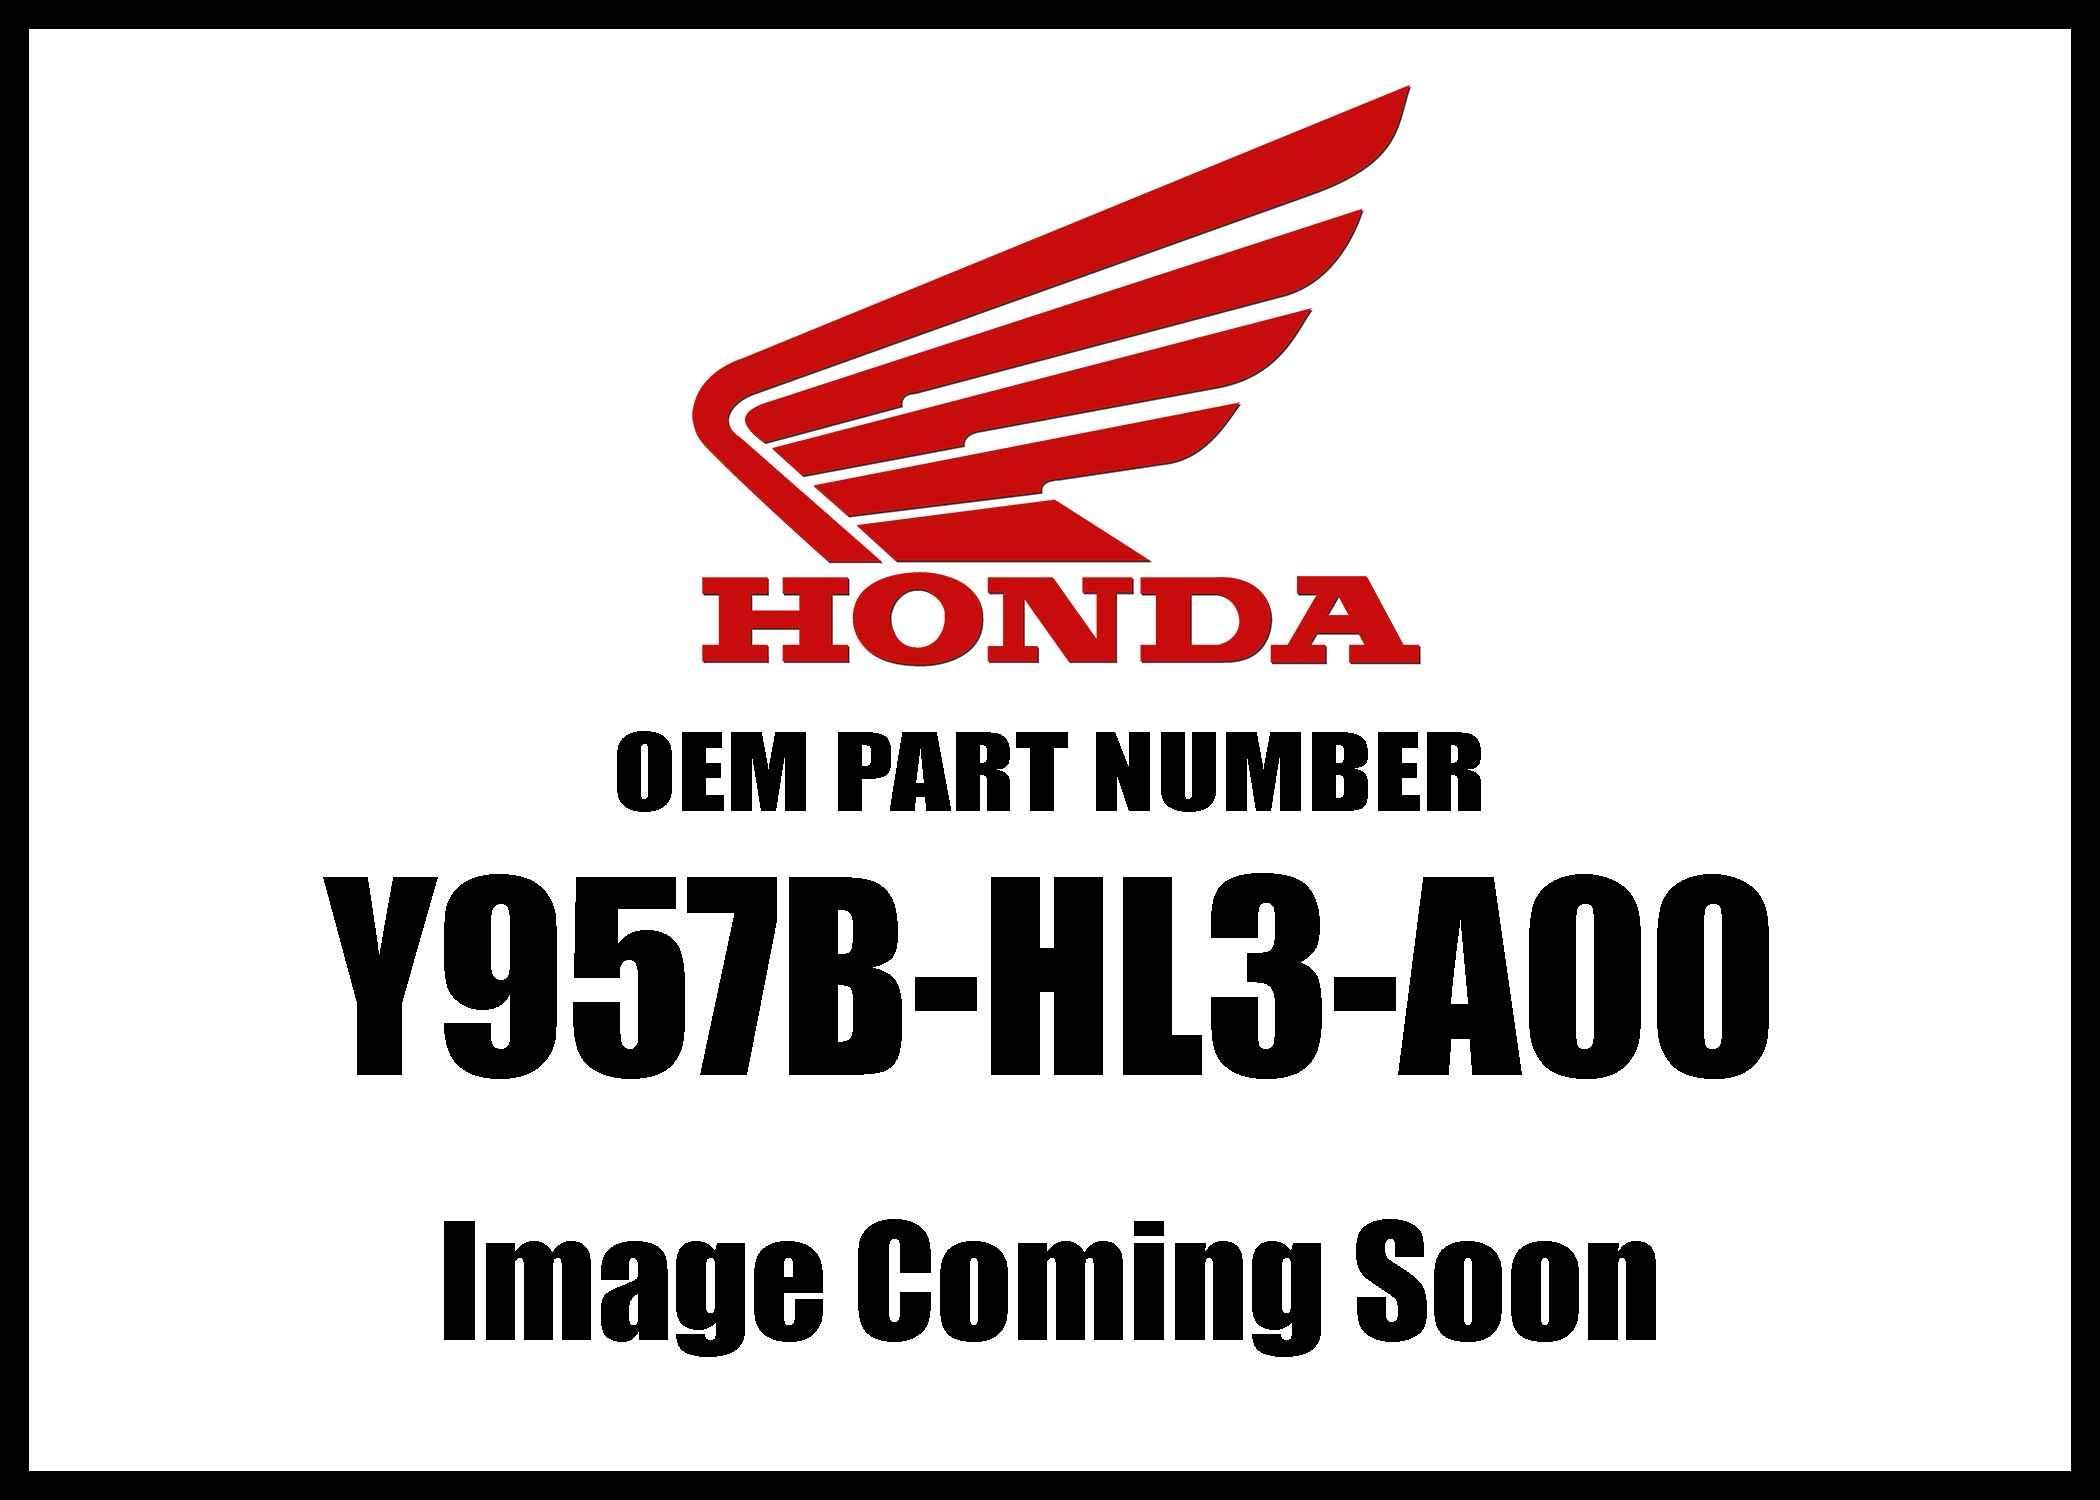 Honda Rt5000 Bolt Flange 8X18 Y957b-Hl3-A00 New Oem